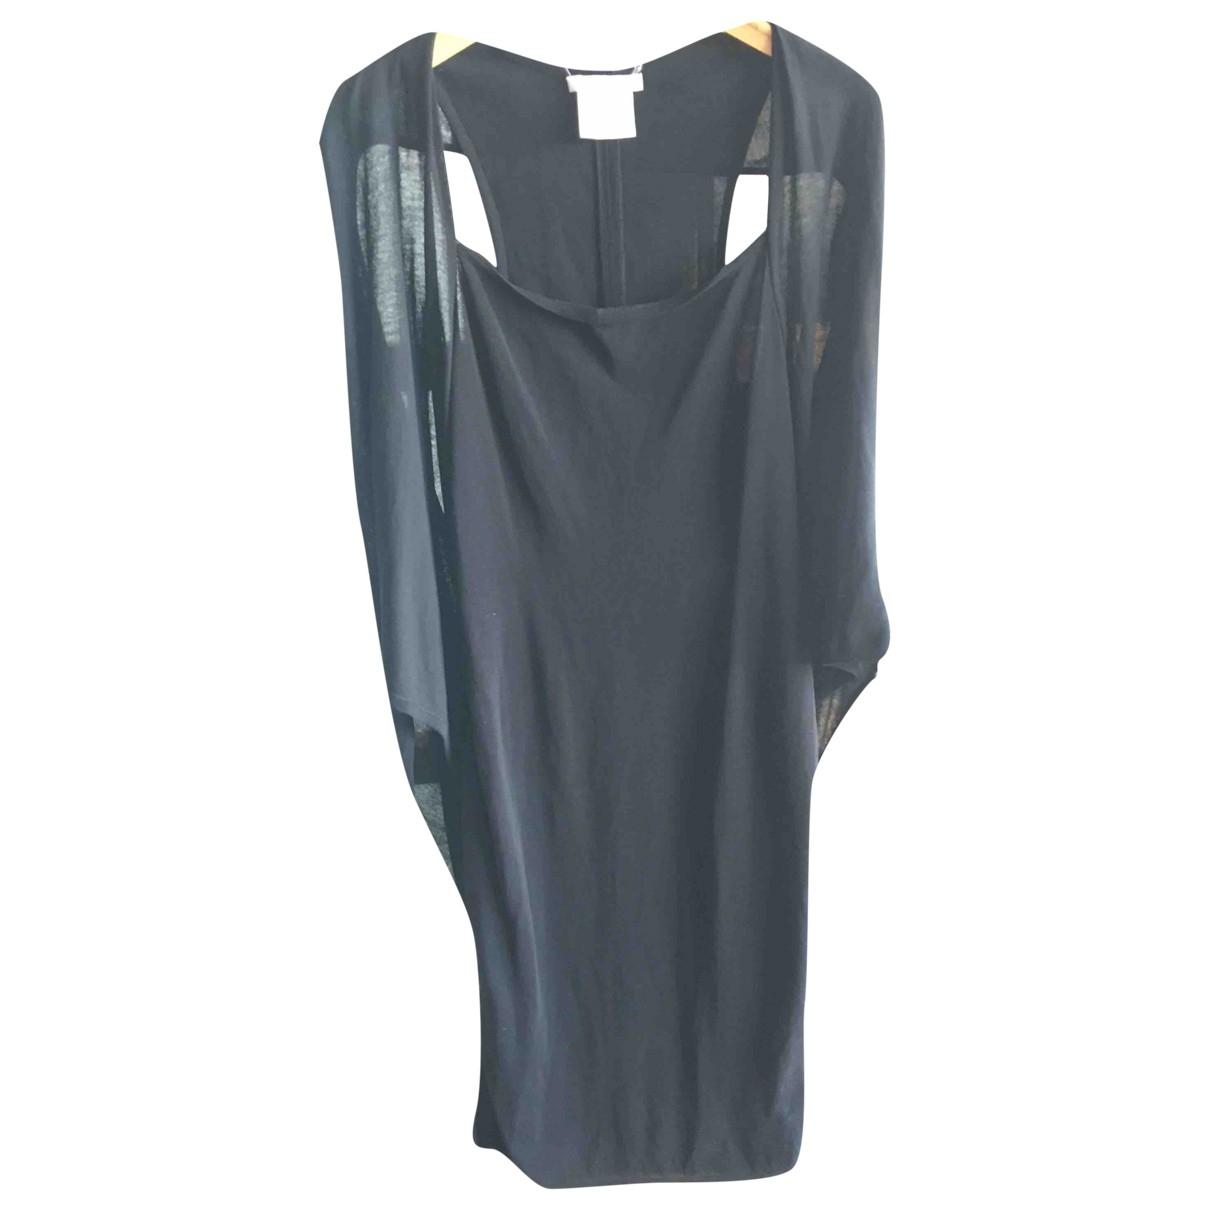 Givenchy \N Black Cotton dress for Women M International